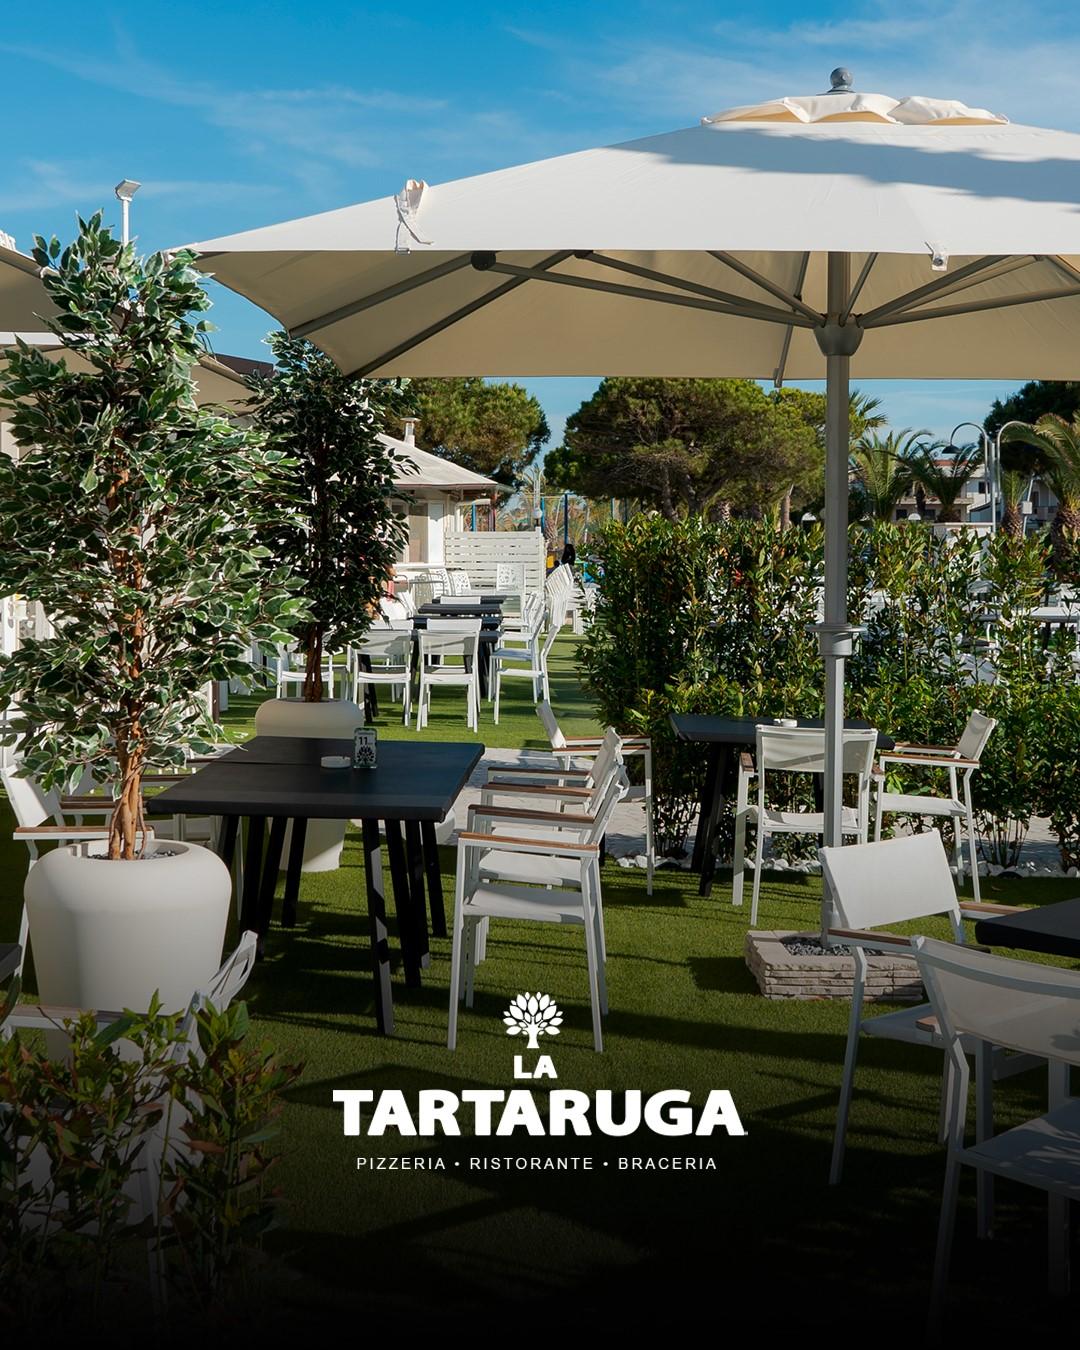 La Tartaruga